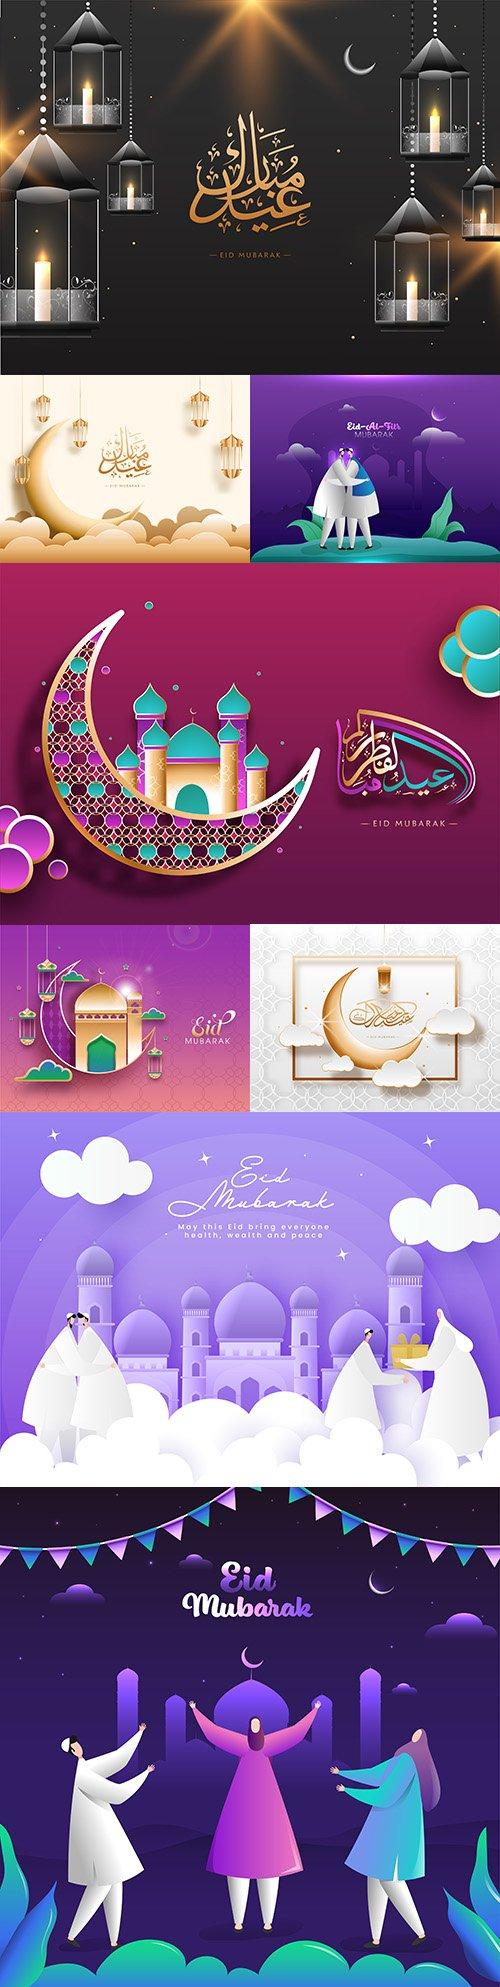 Eid Mubarak Arabic Islamic calligraphic text concept celebration